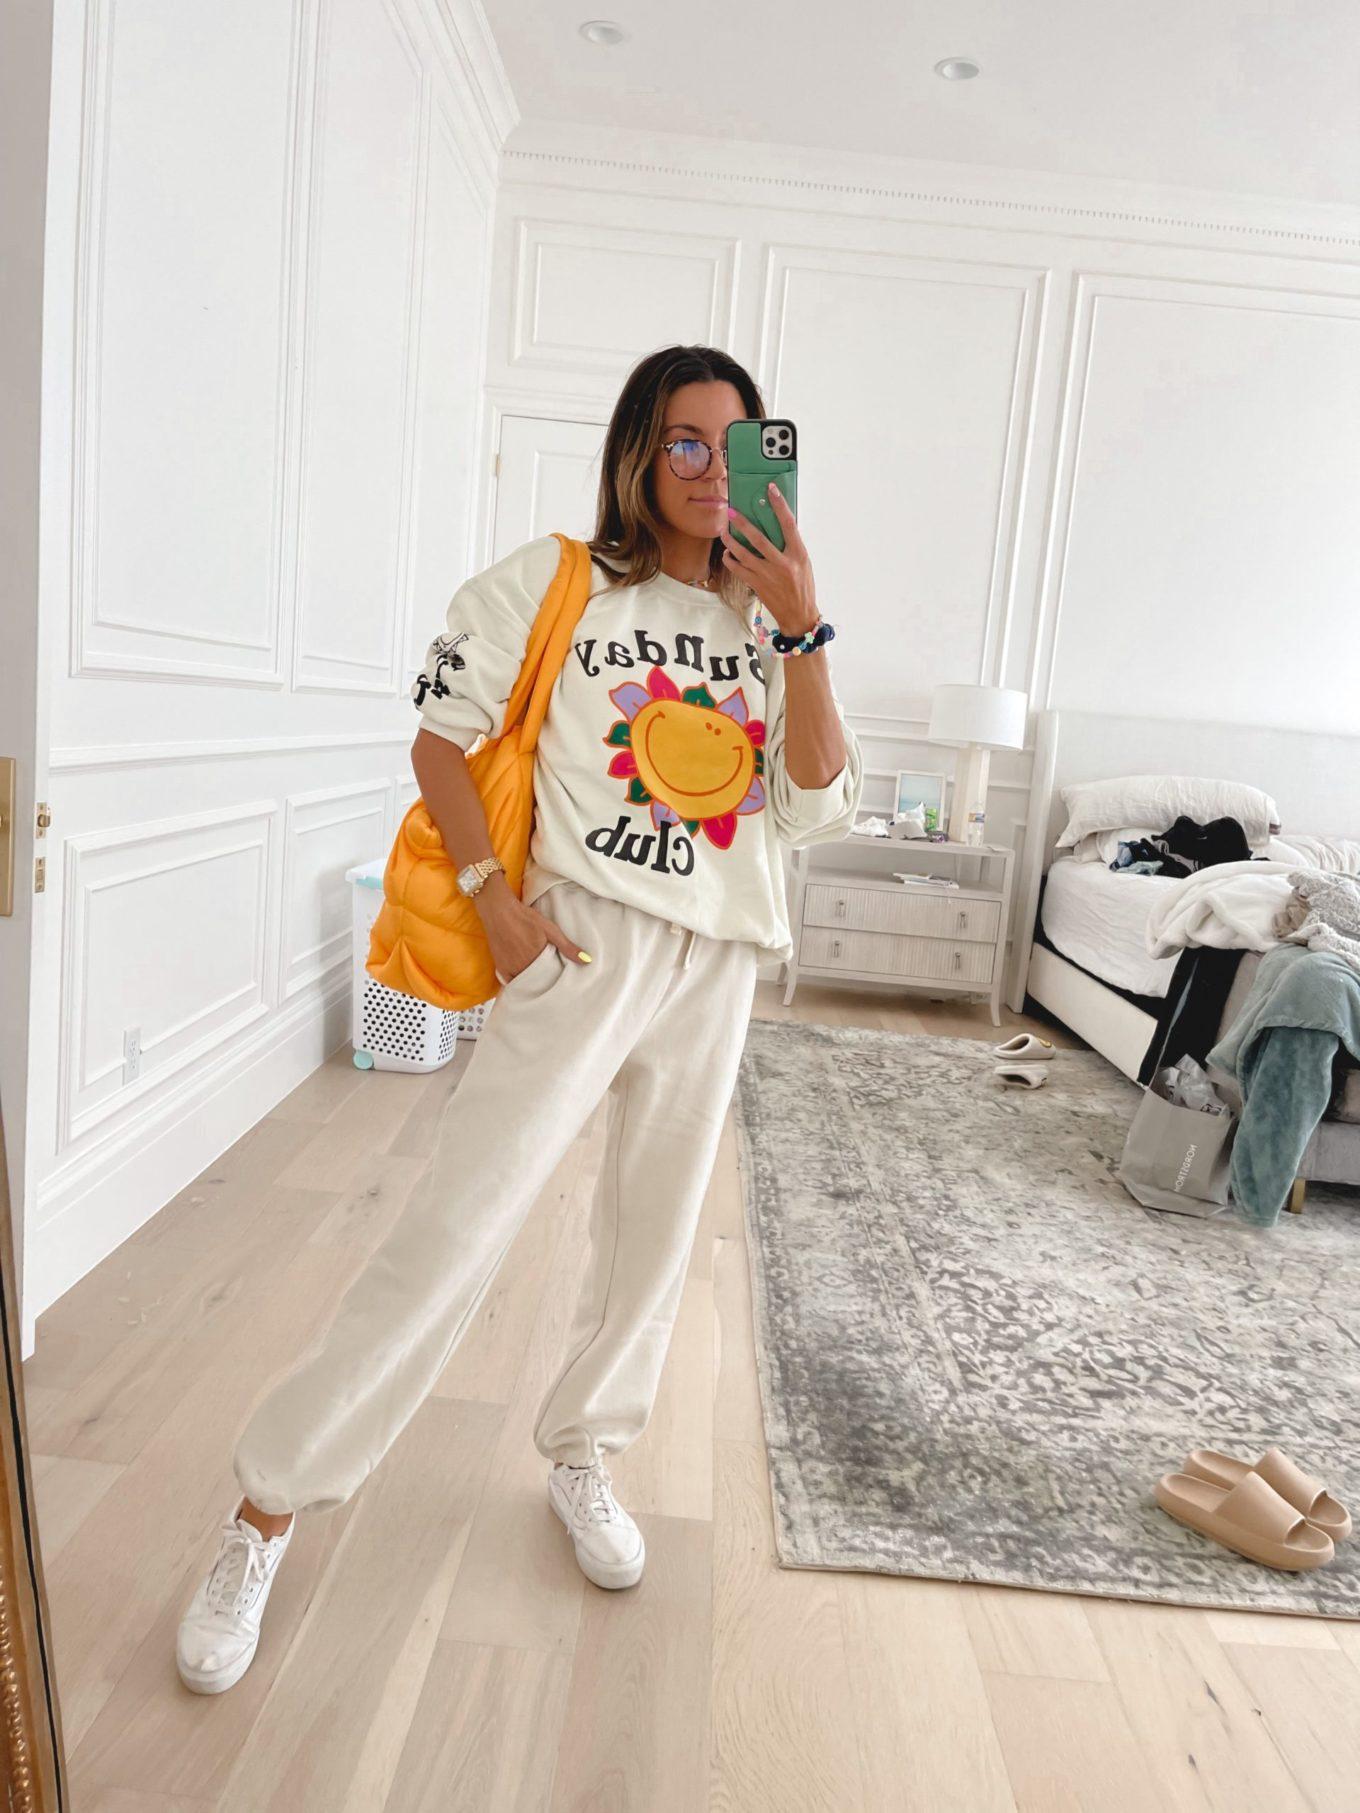 Sunday club sweatshirt, top-selling, June, nordstrom, unisex